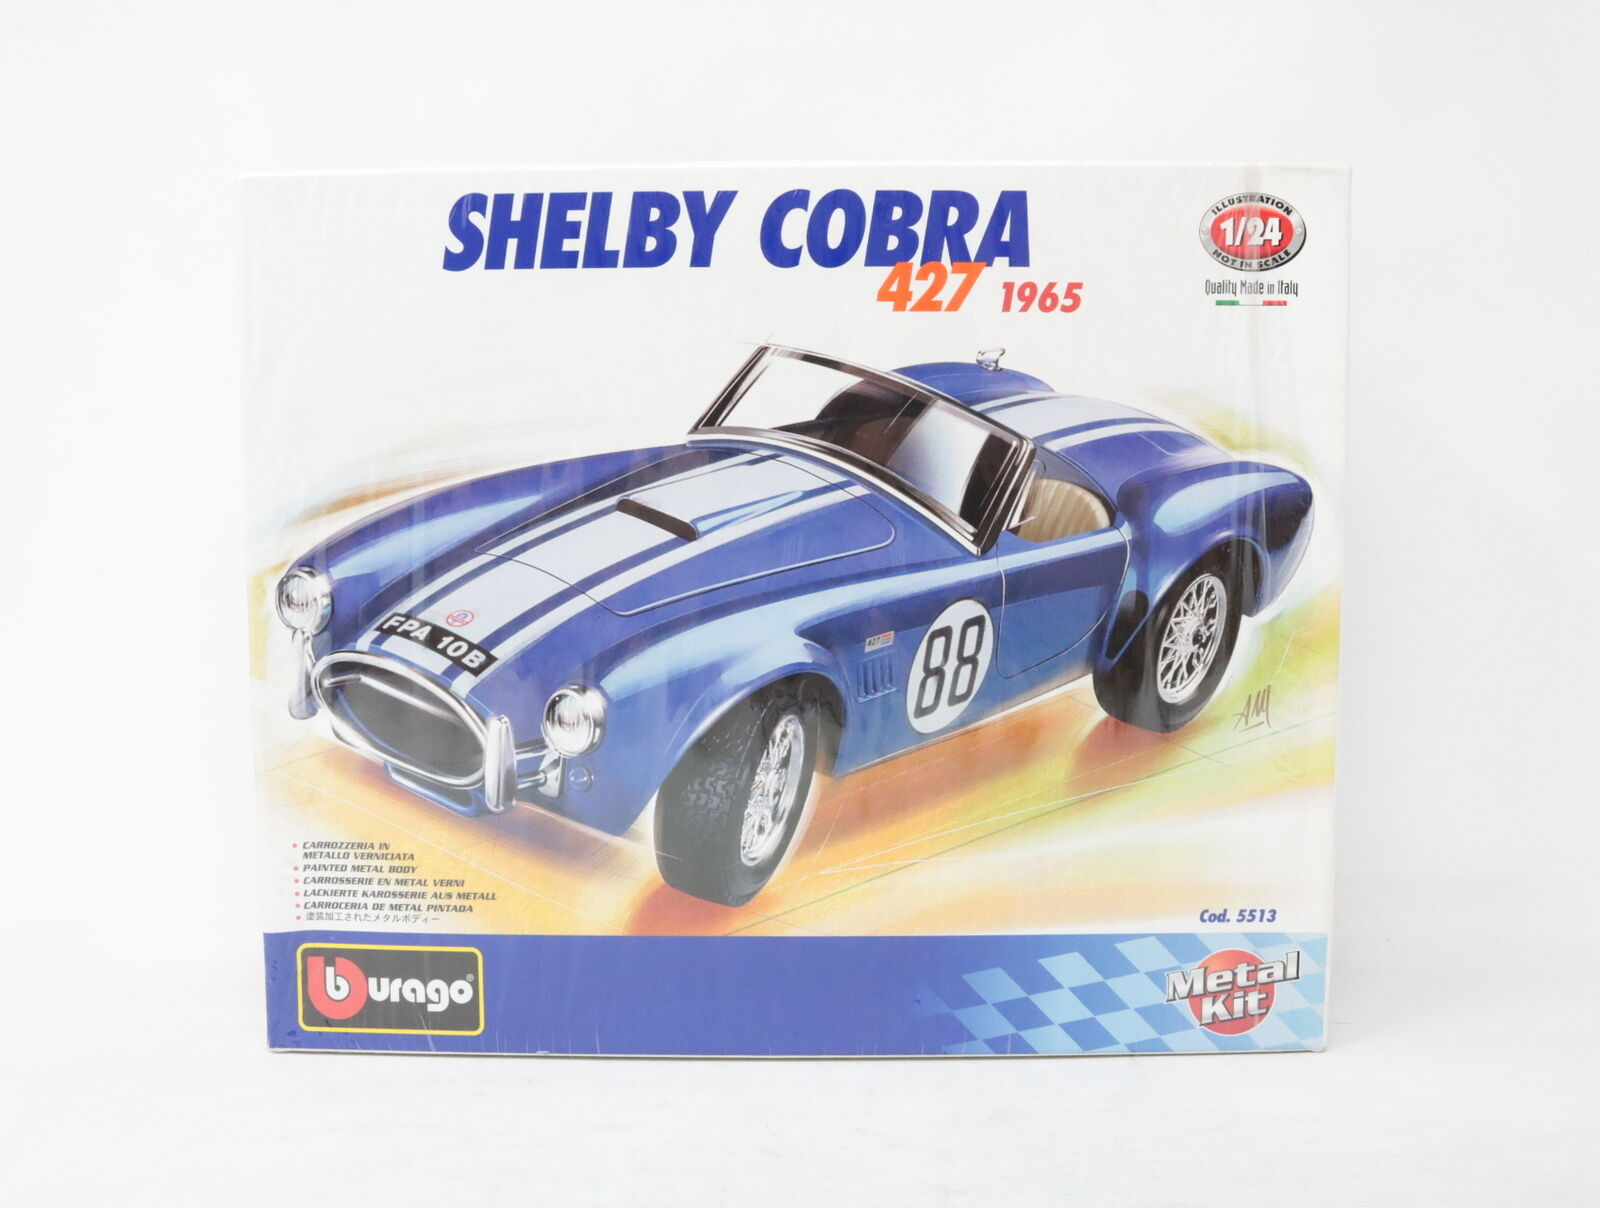 1 24 BBURAGO METAL KIT SHELBY COBRA 427 cod. 5513  [YE-018]